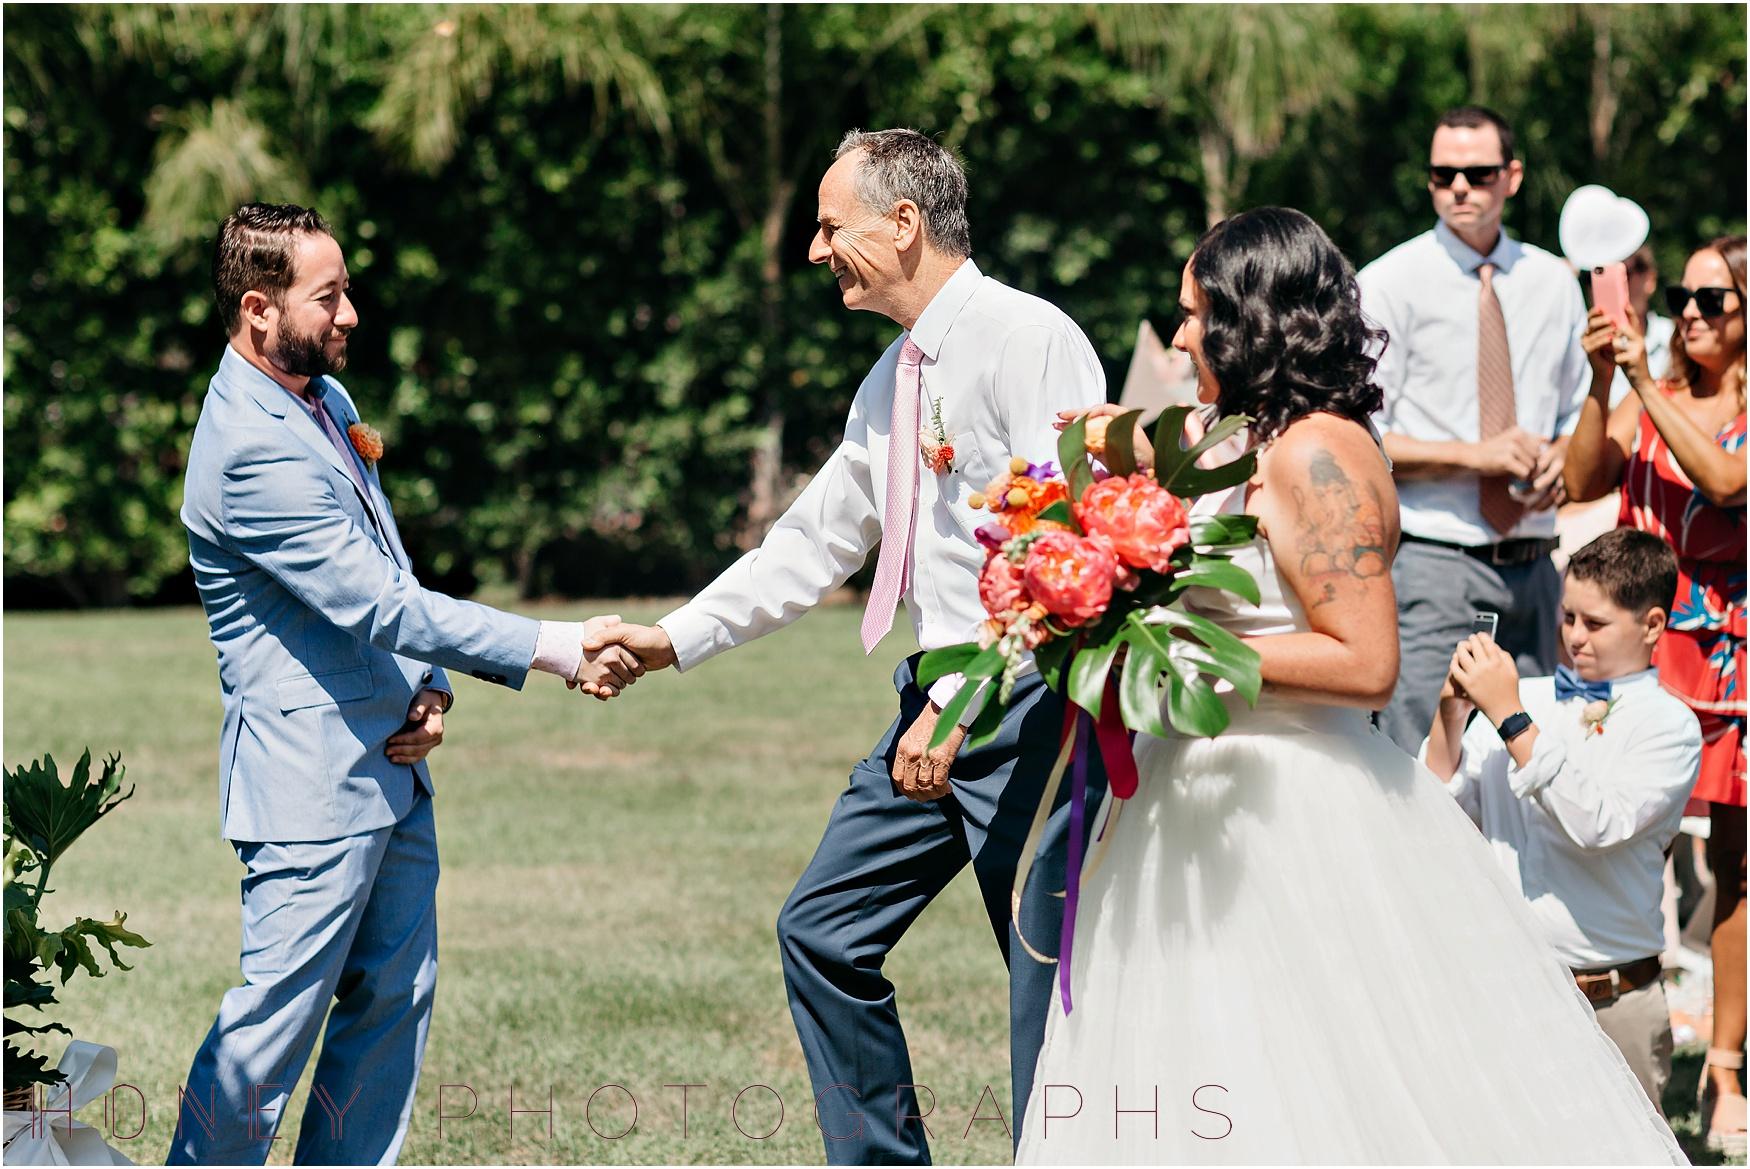 colorful_ecclectic_vibrant_vista_rainbow_quirky_wedding016.jpg